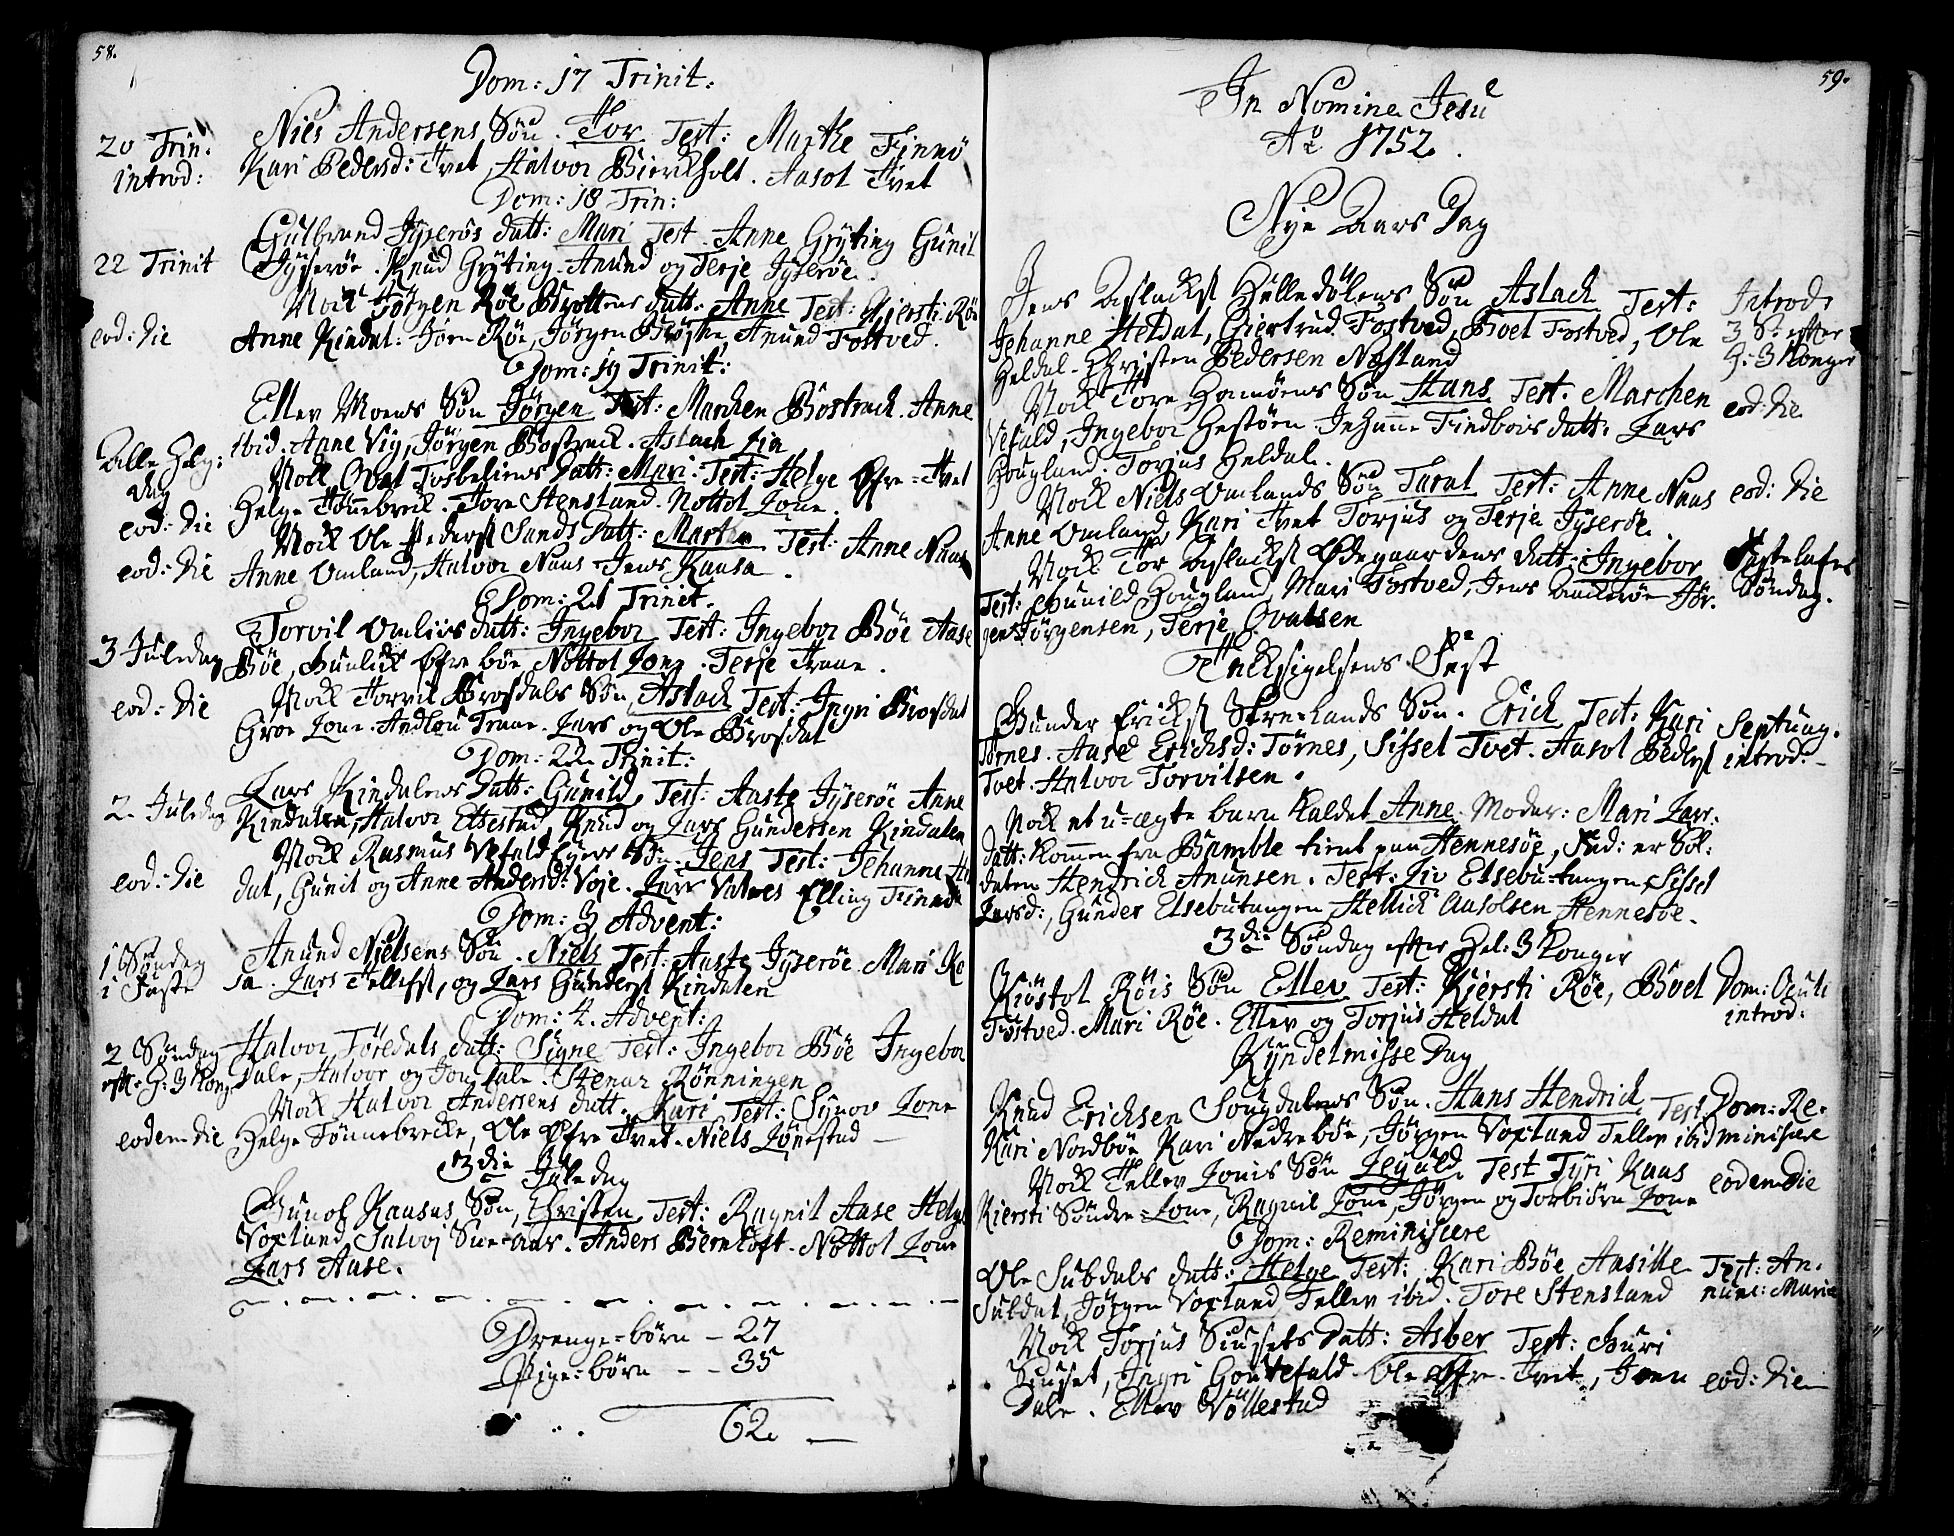 SAKO, Drangedal kirkebøker, F/Fa/L0001: Ministerialbok nr. 1, 1697-1767, s. 58-59